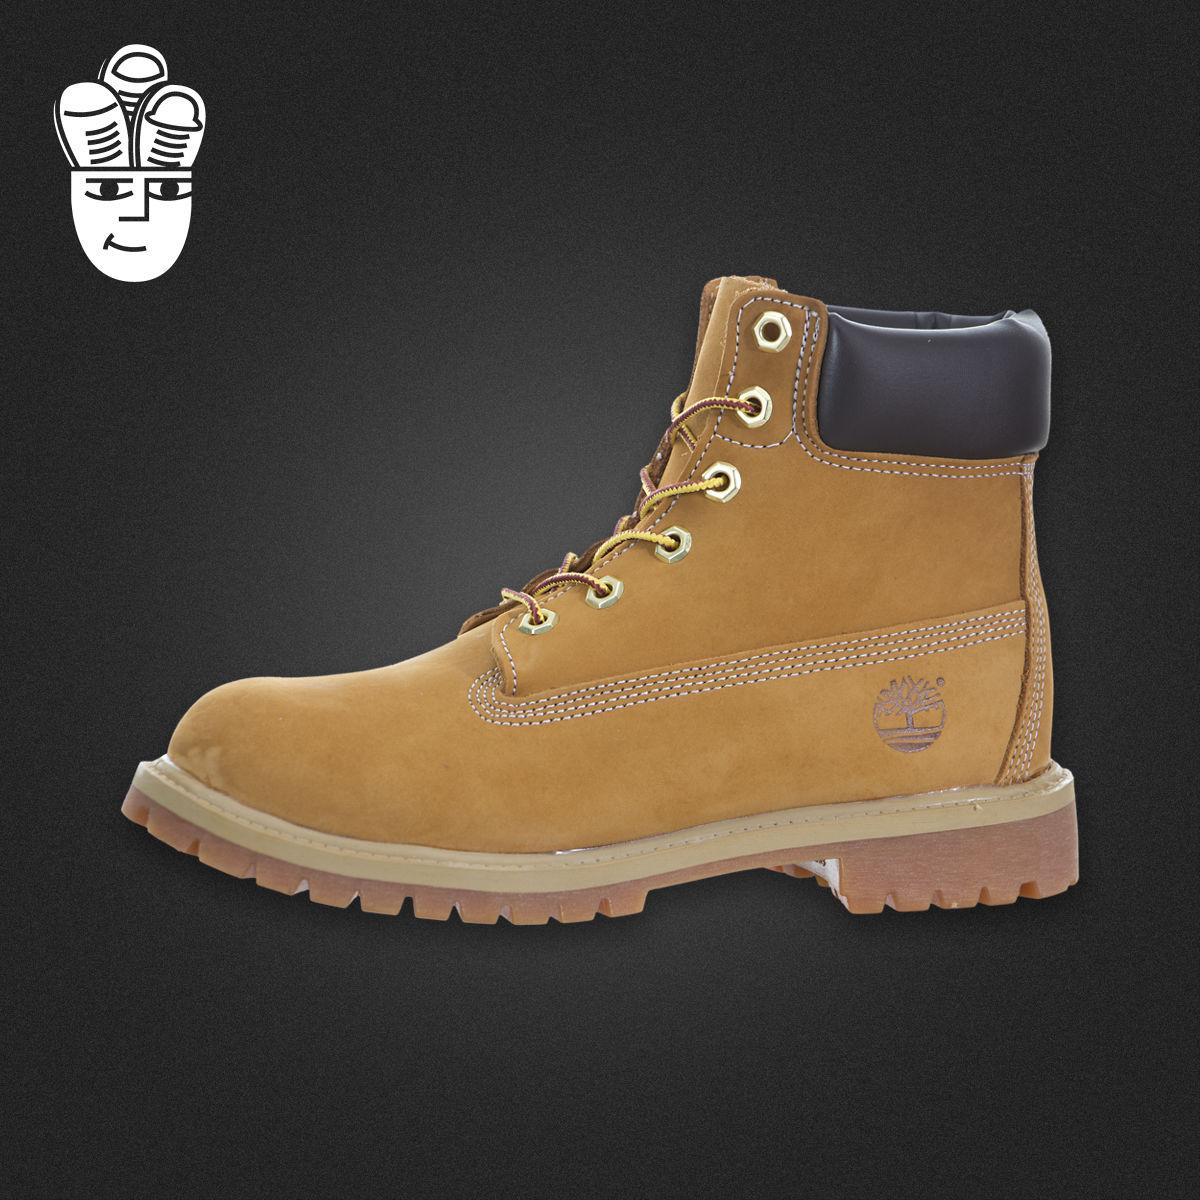 添柏嵐 Timberland 6-Inch Boot 男鞋女鞋 GS 經典6英寸潮靴